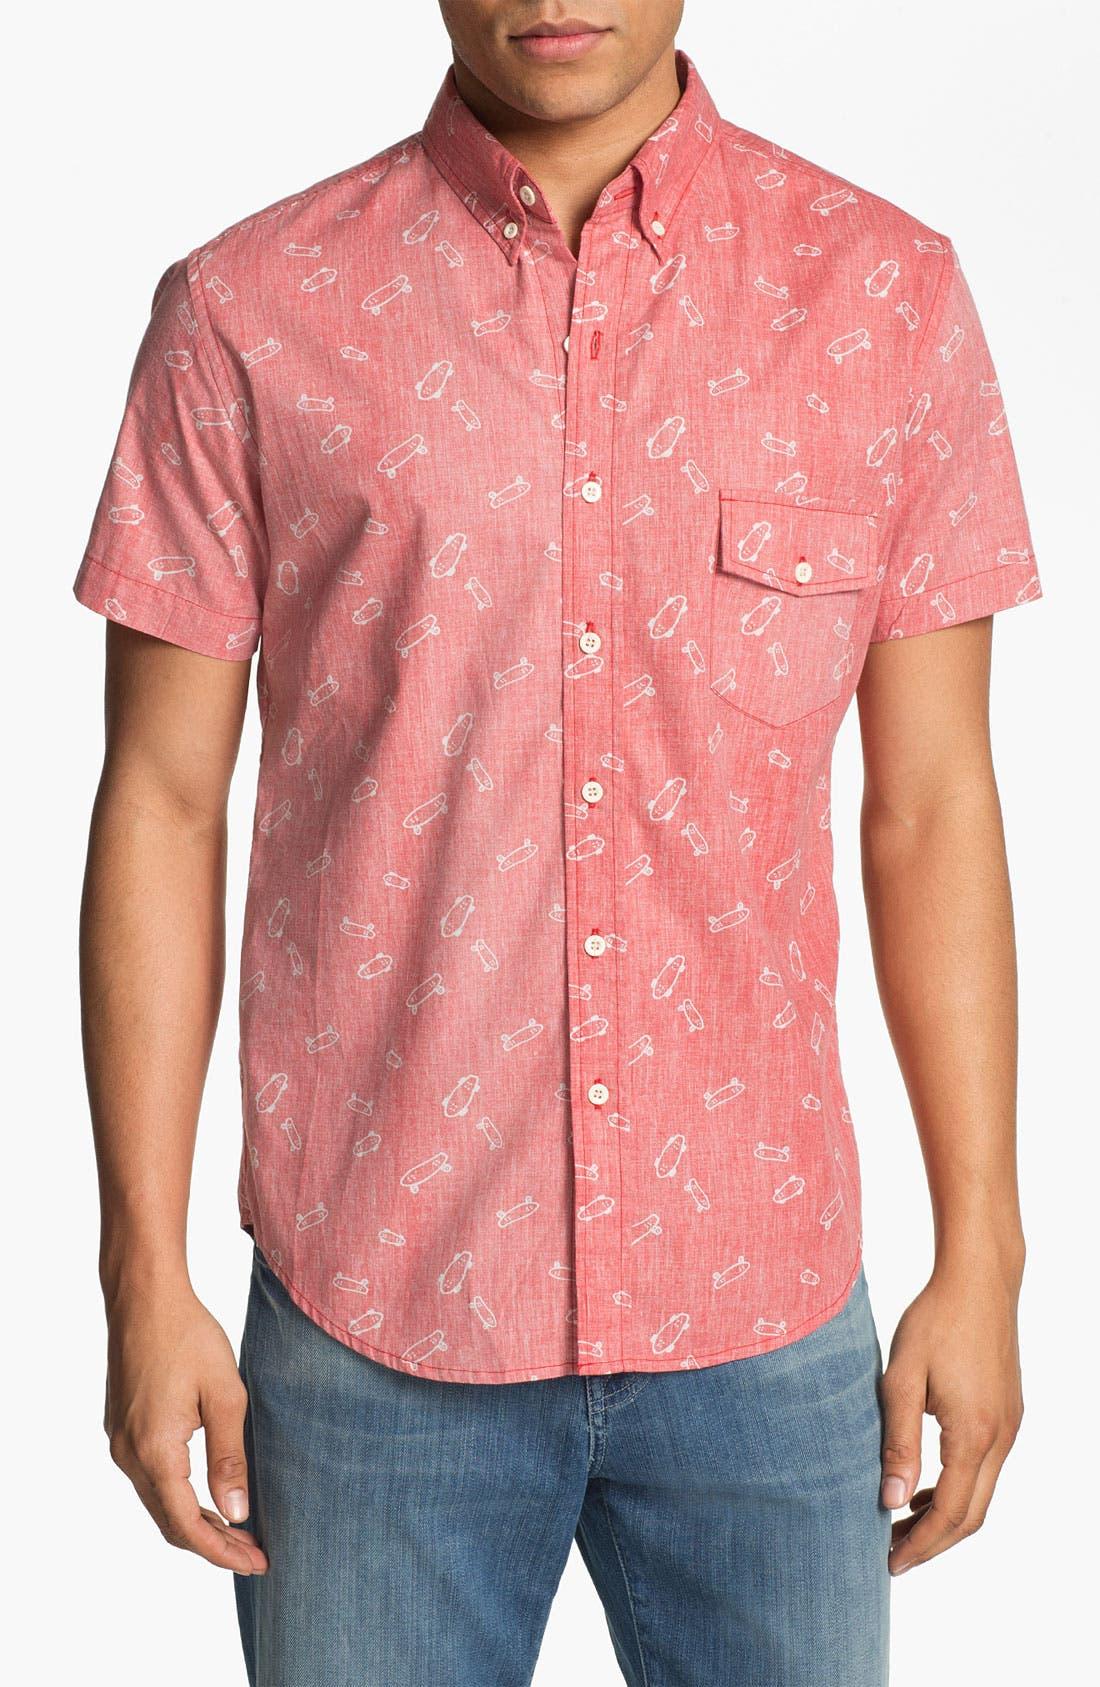 Alternate Image 1 Selected - Altru Skateboard Print Woven Shirt